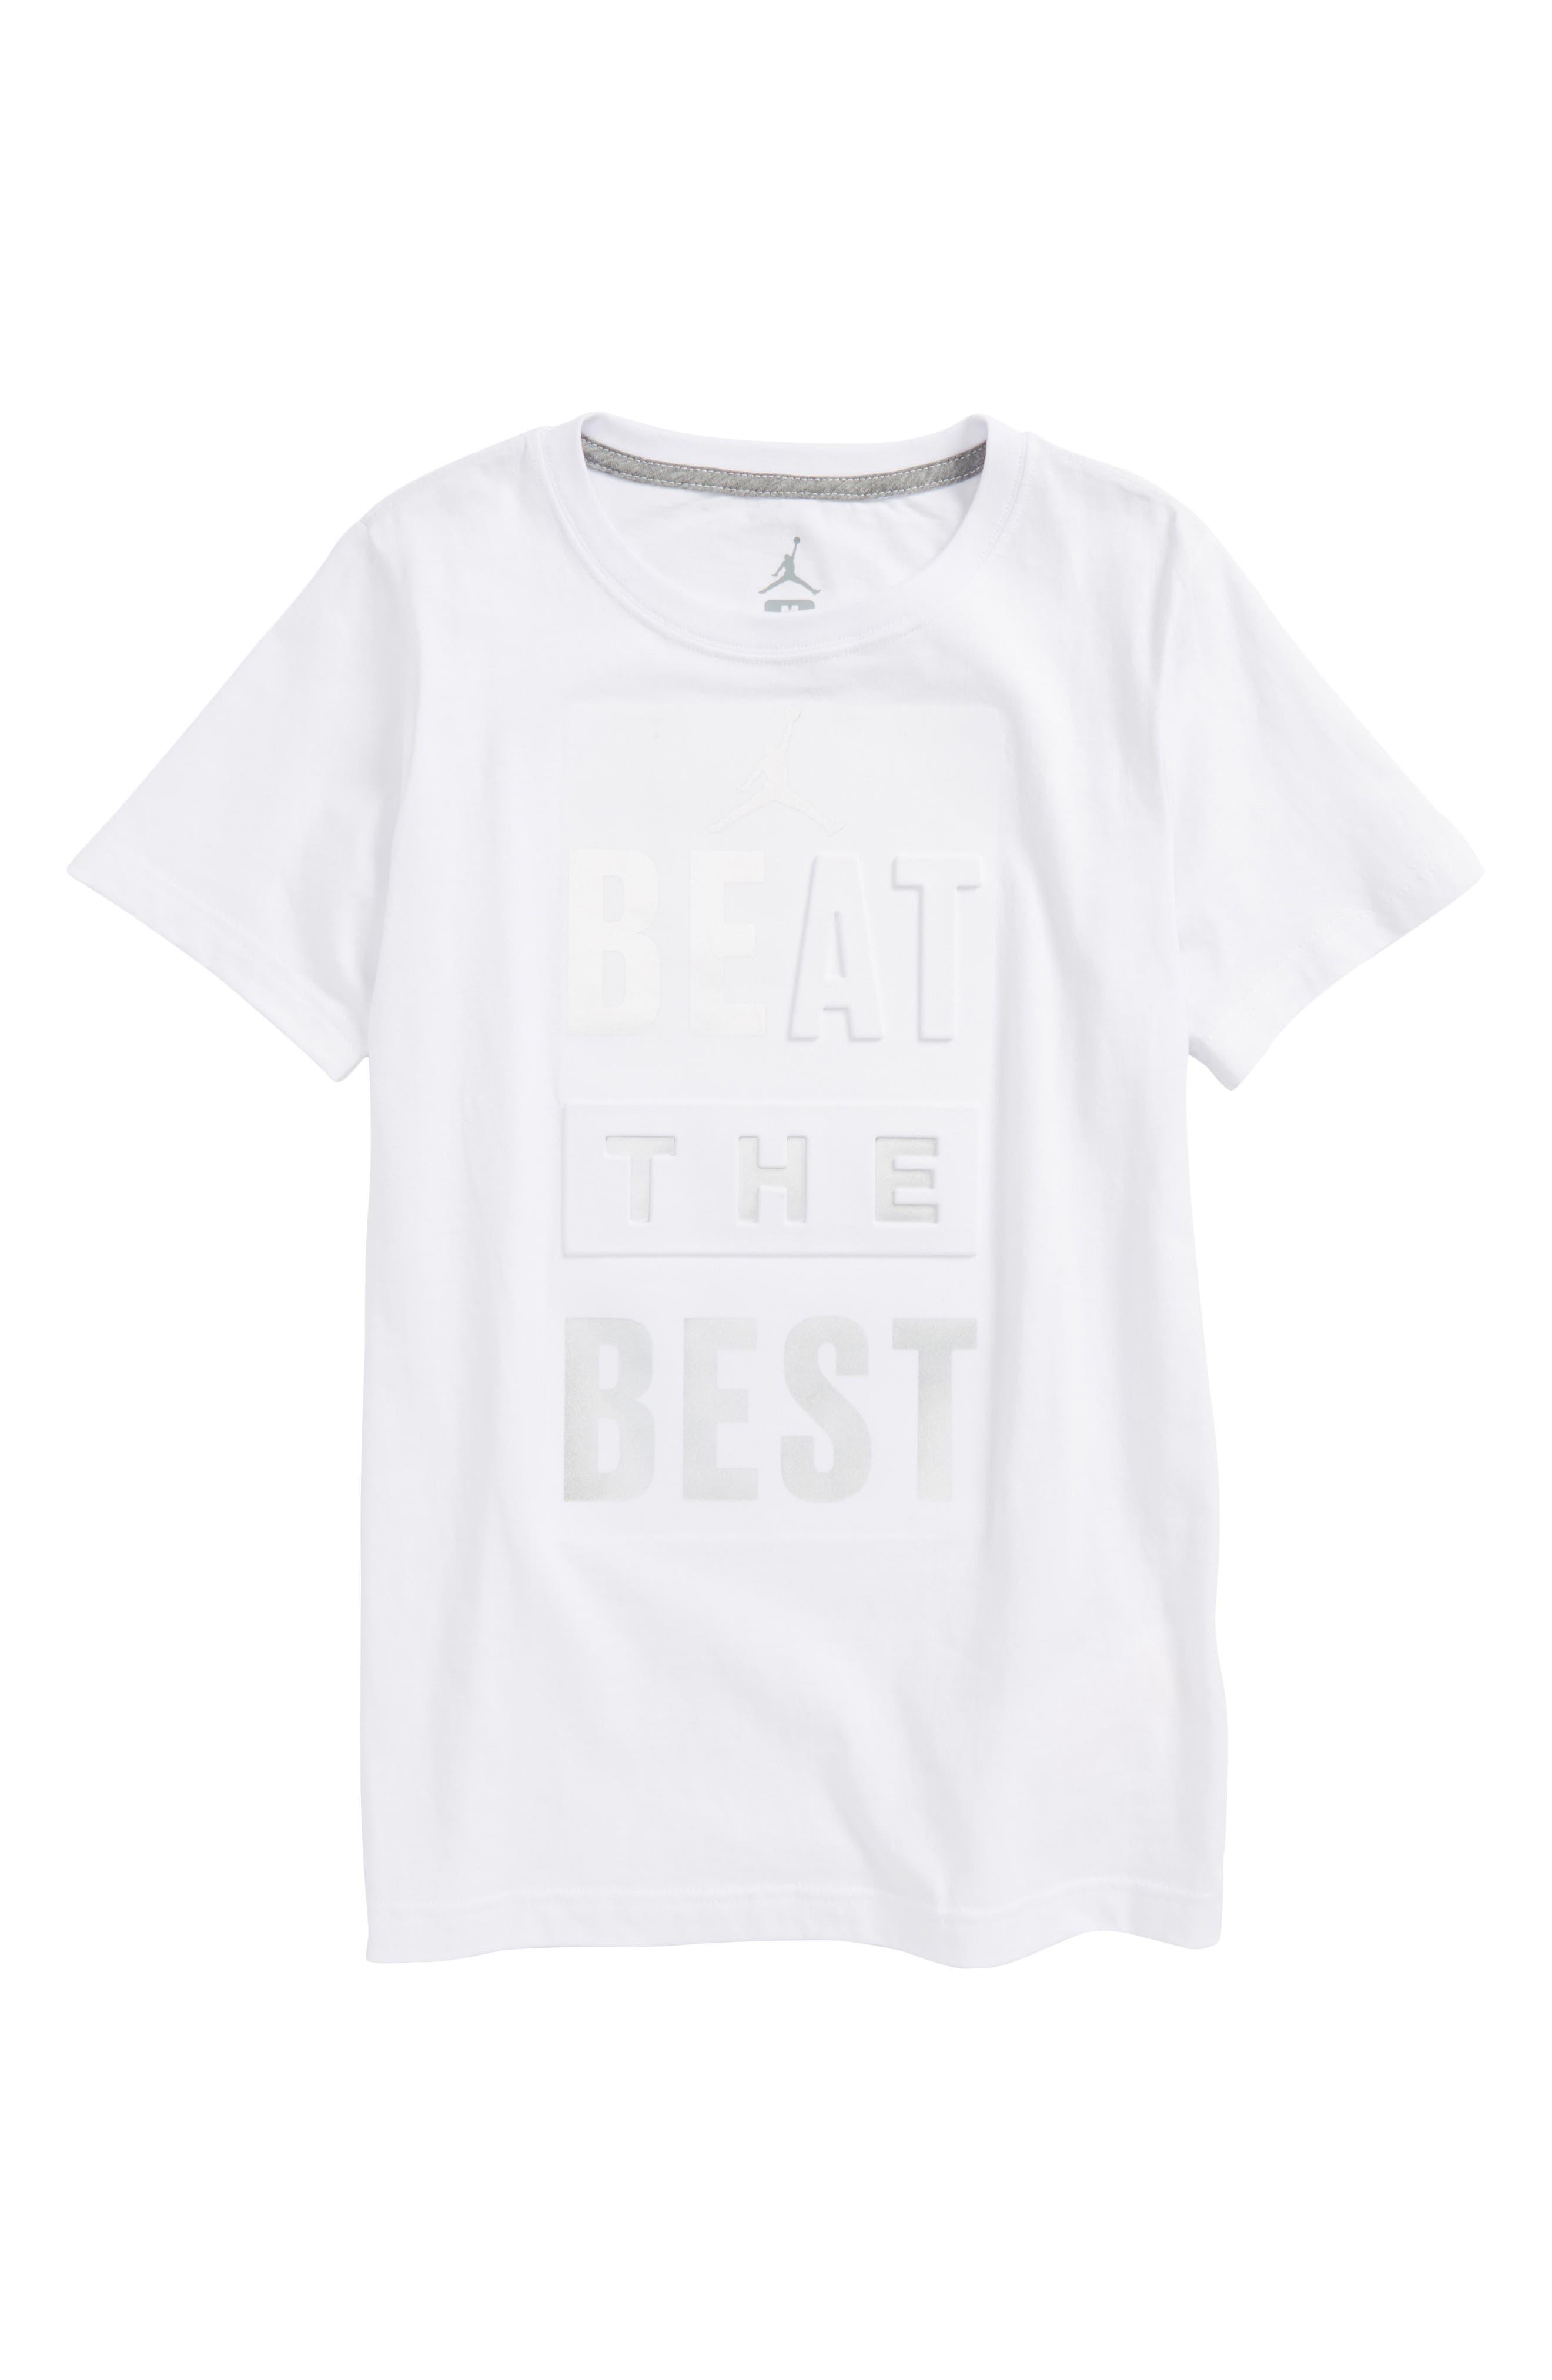 Jordan Beat the Best Graphic T-Shirt,                         Main,                         color,